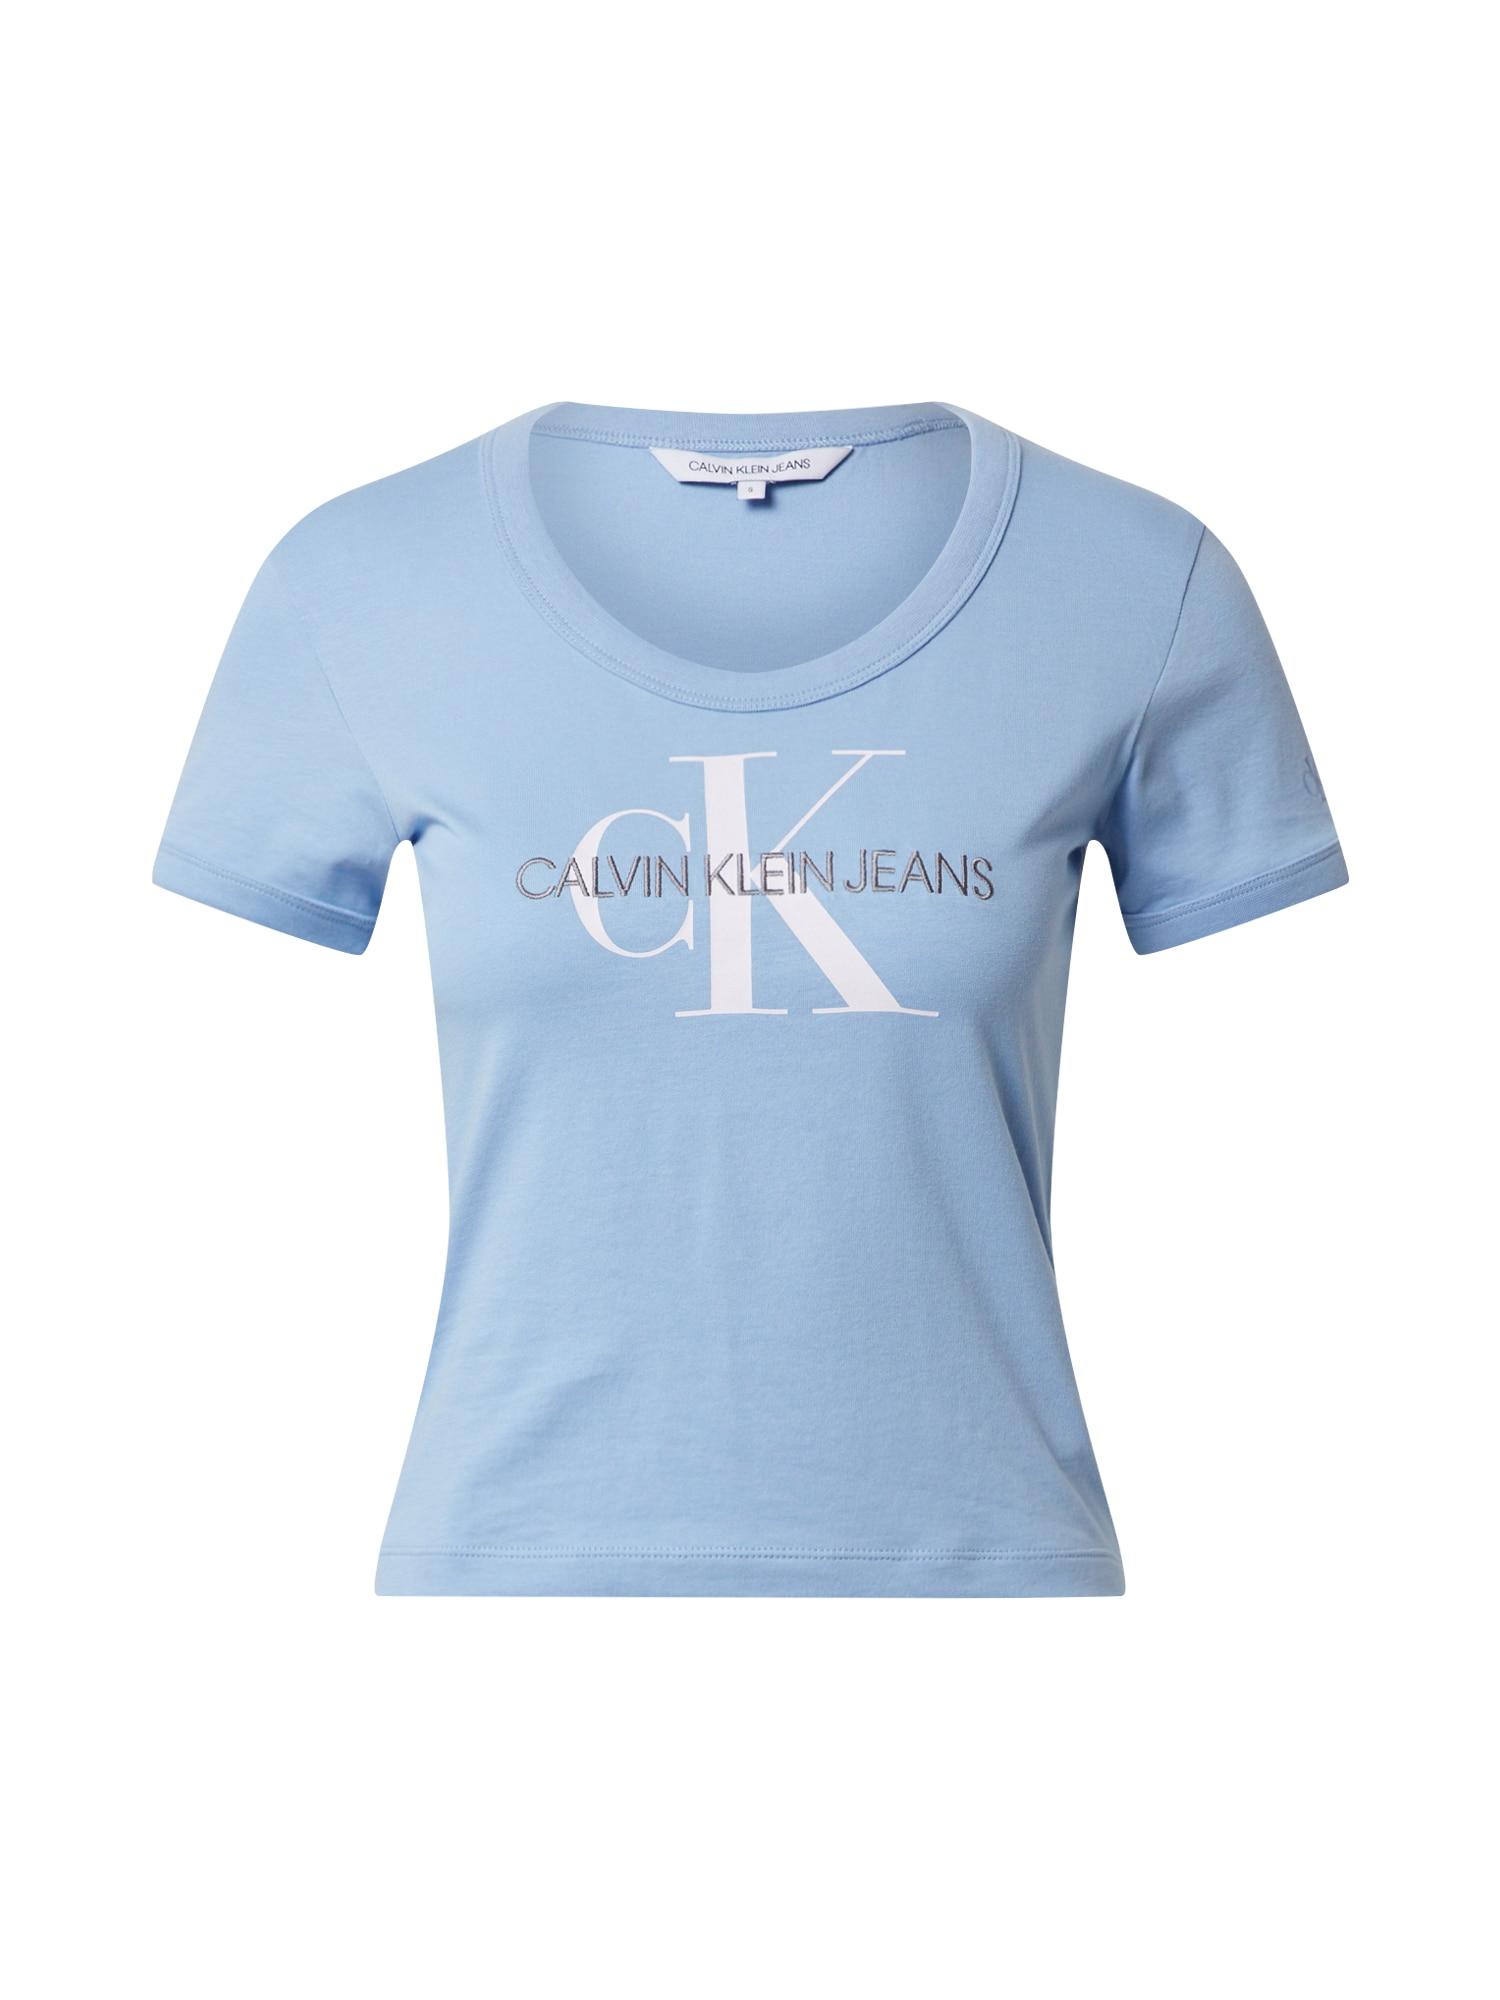 Calvin Klein Jeans Tričko 'VEGETABLE DYE MONOGRAM BABY TEE'  světlemodrá